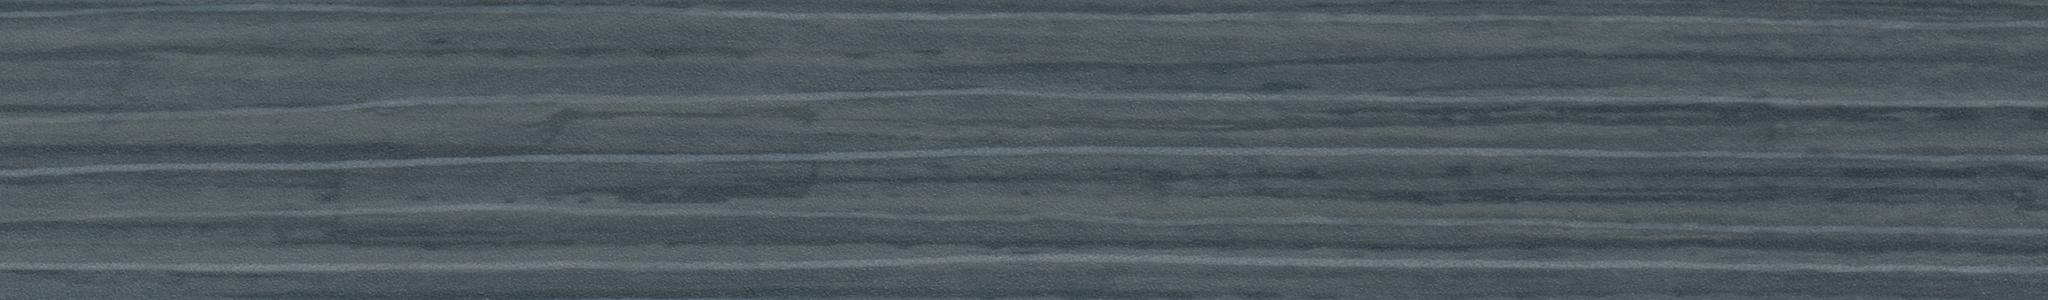 HD 29101 ABS hrana banian černý hladký